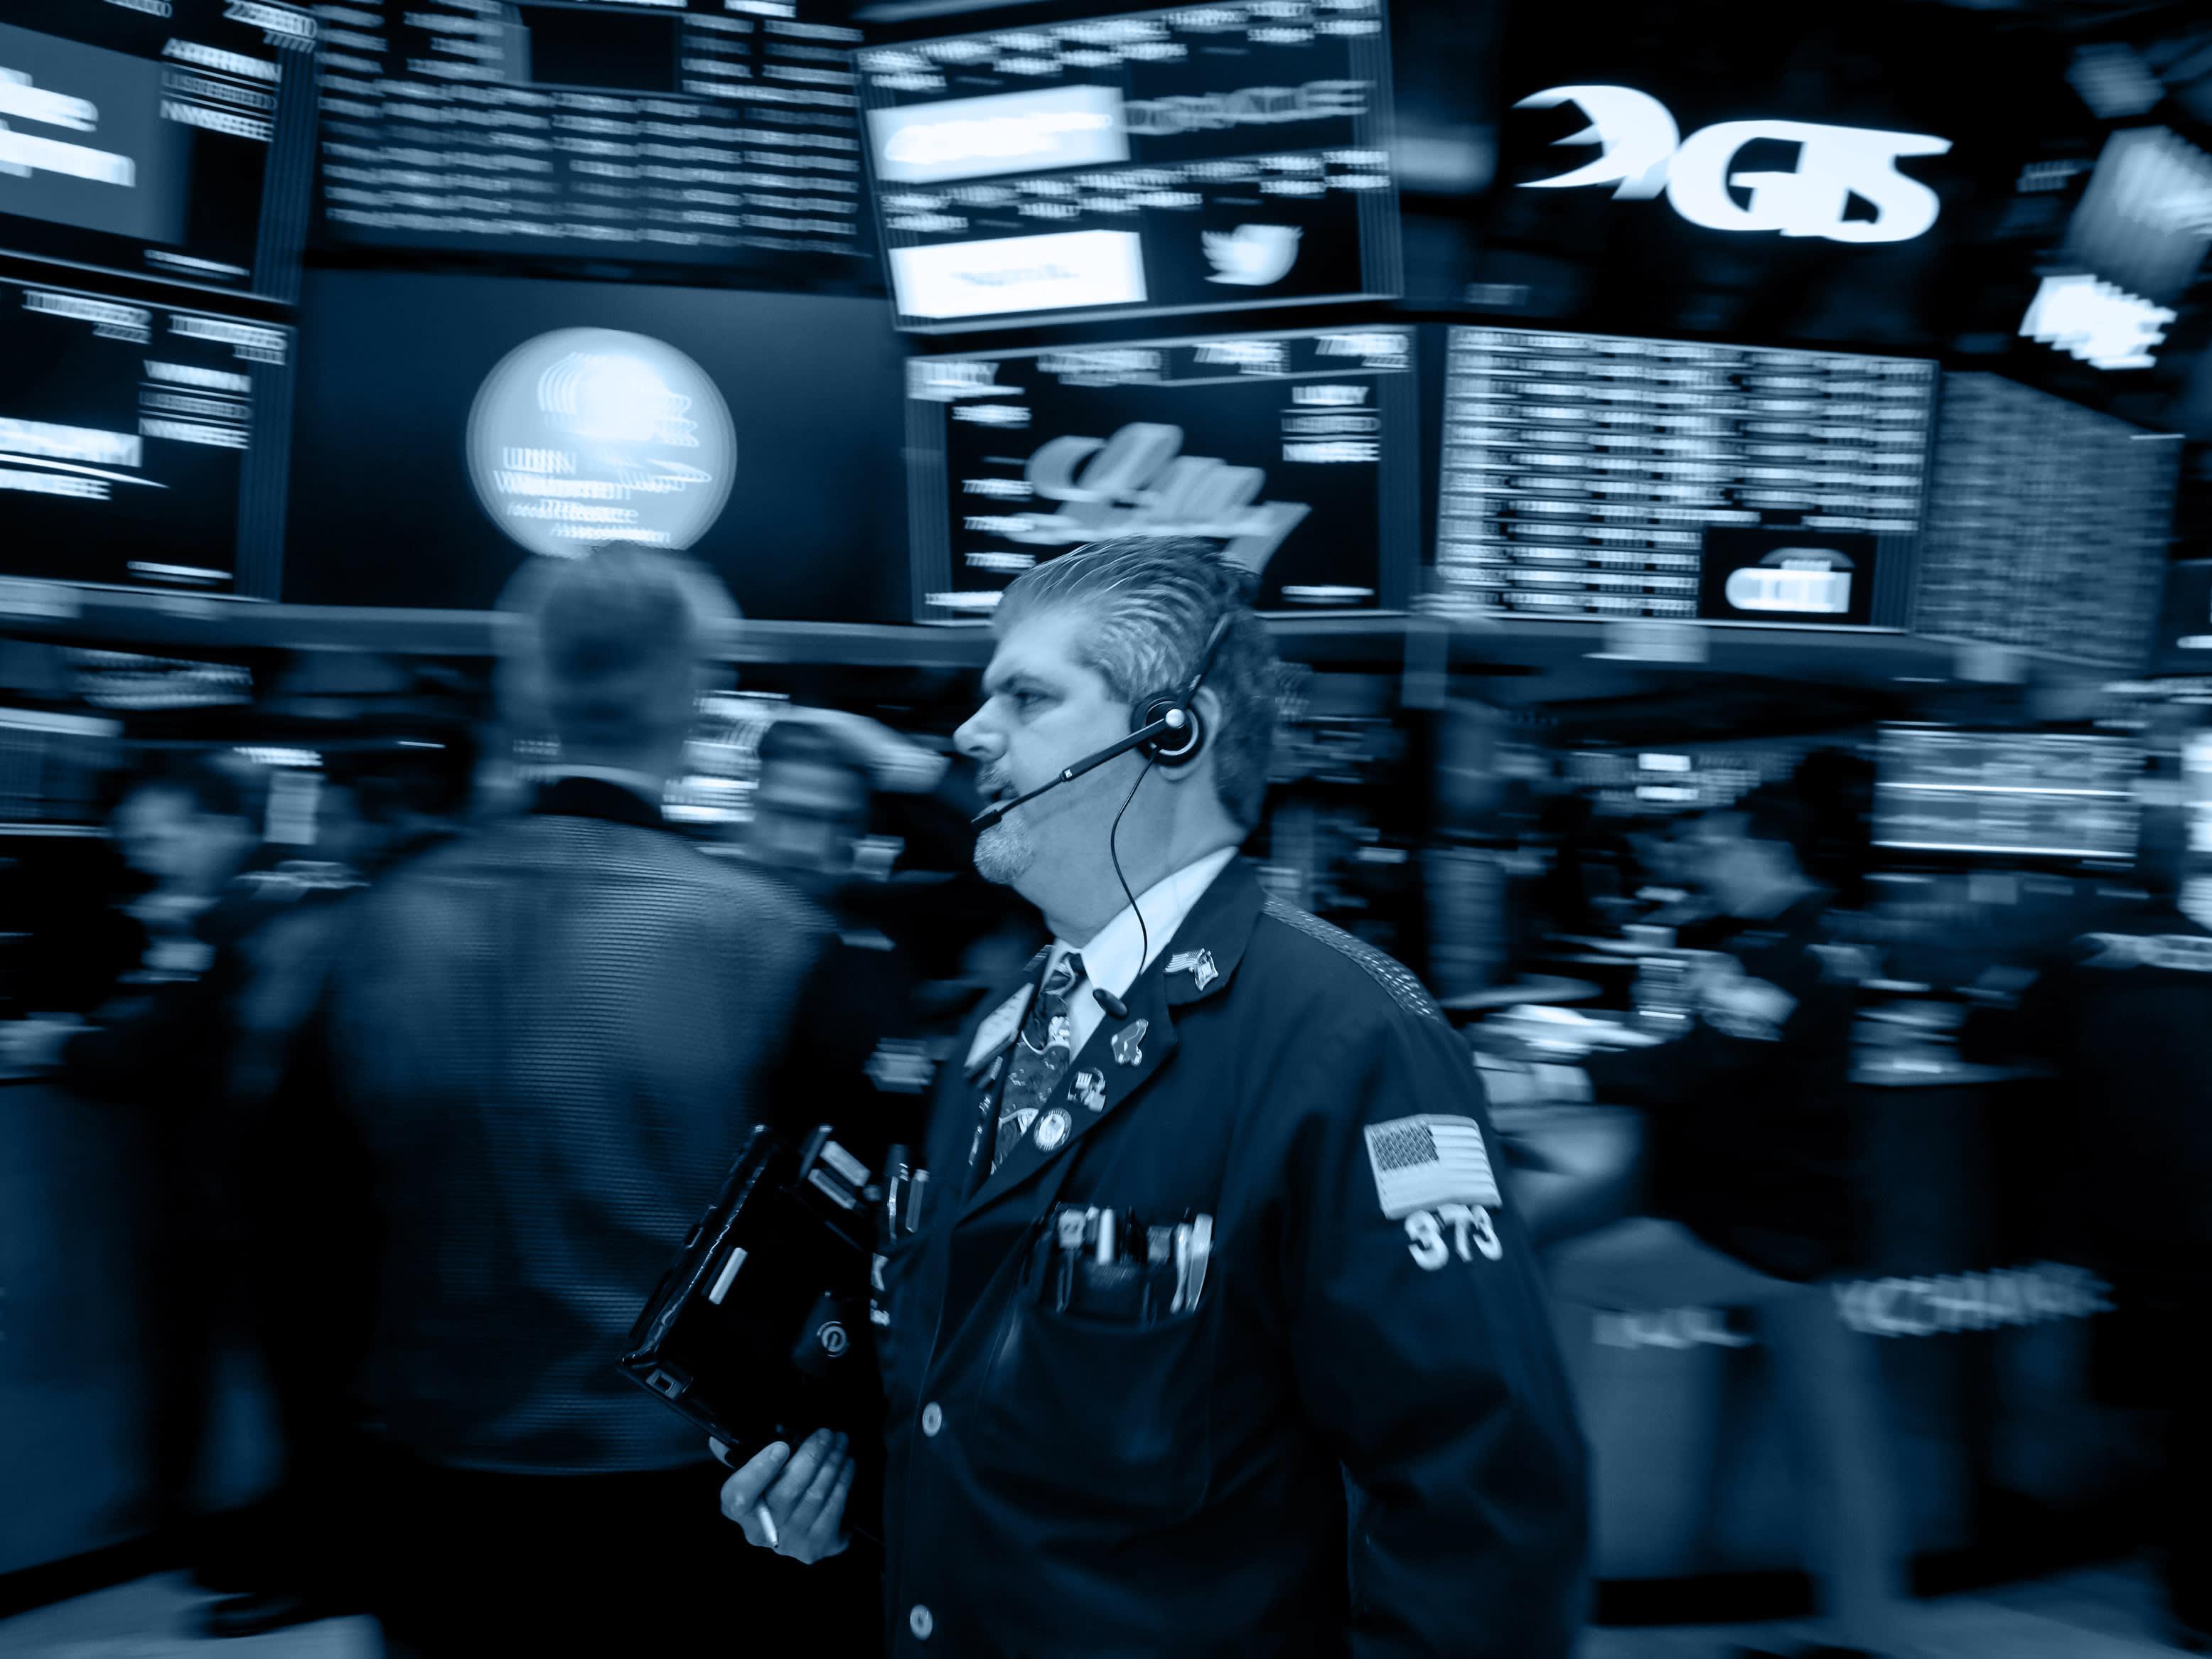 Markets face stiff headwinds